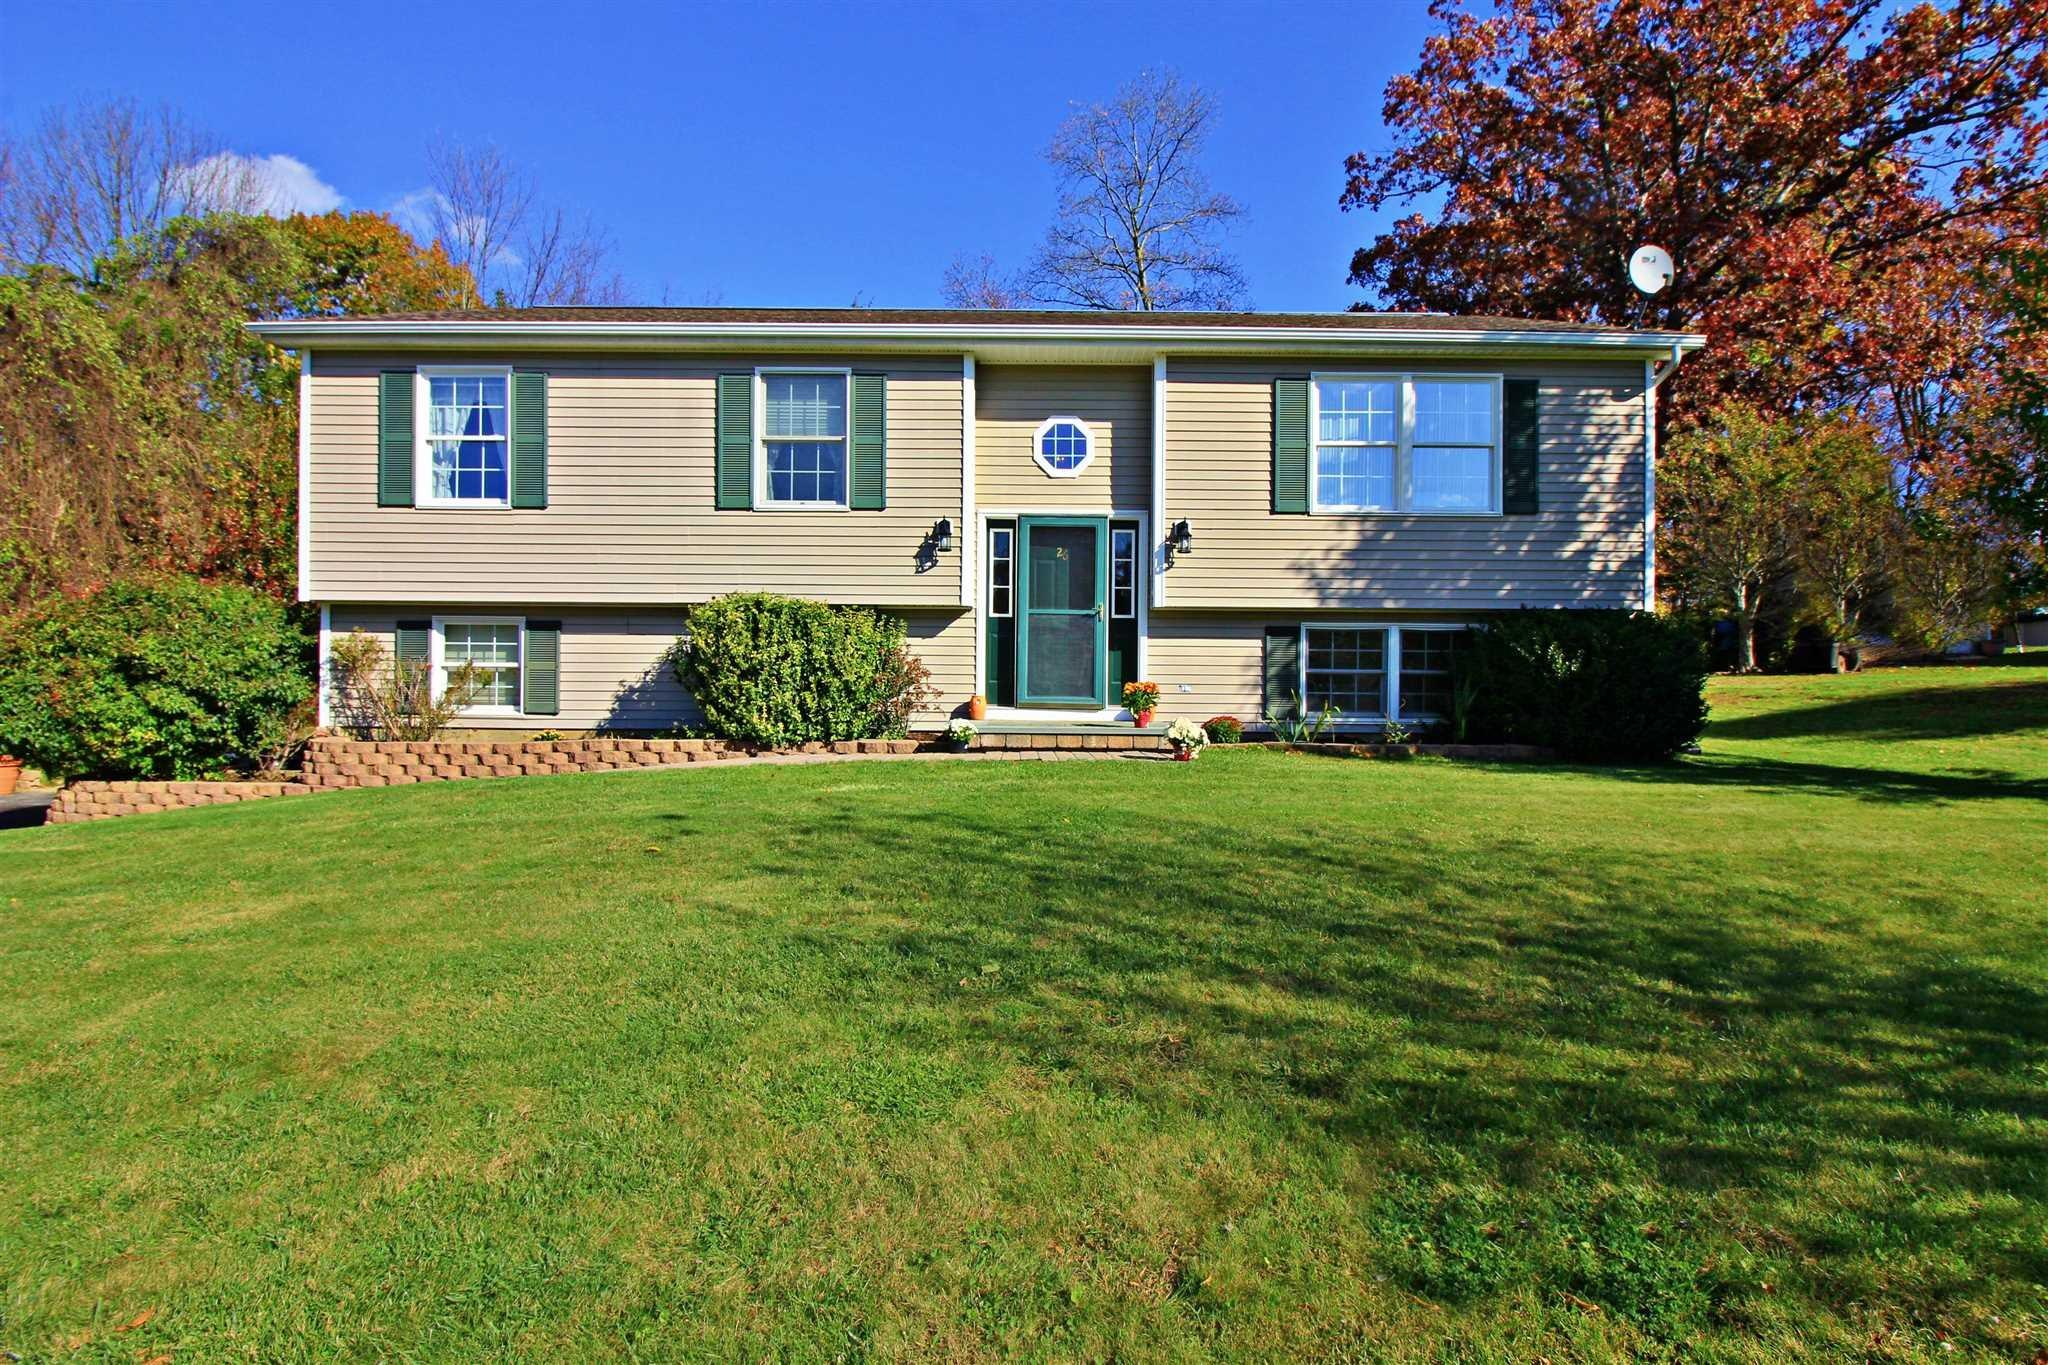 Single Family Home for Sale at 26 WHITE OAK Circle 26 WHITE OAK Circle Dover Plains, New York 12594 United States